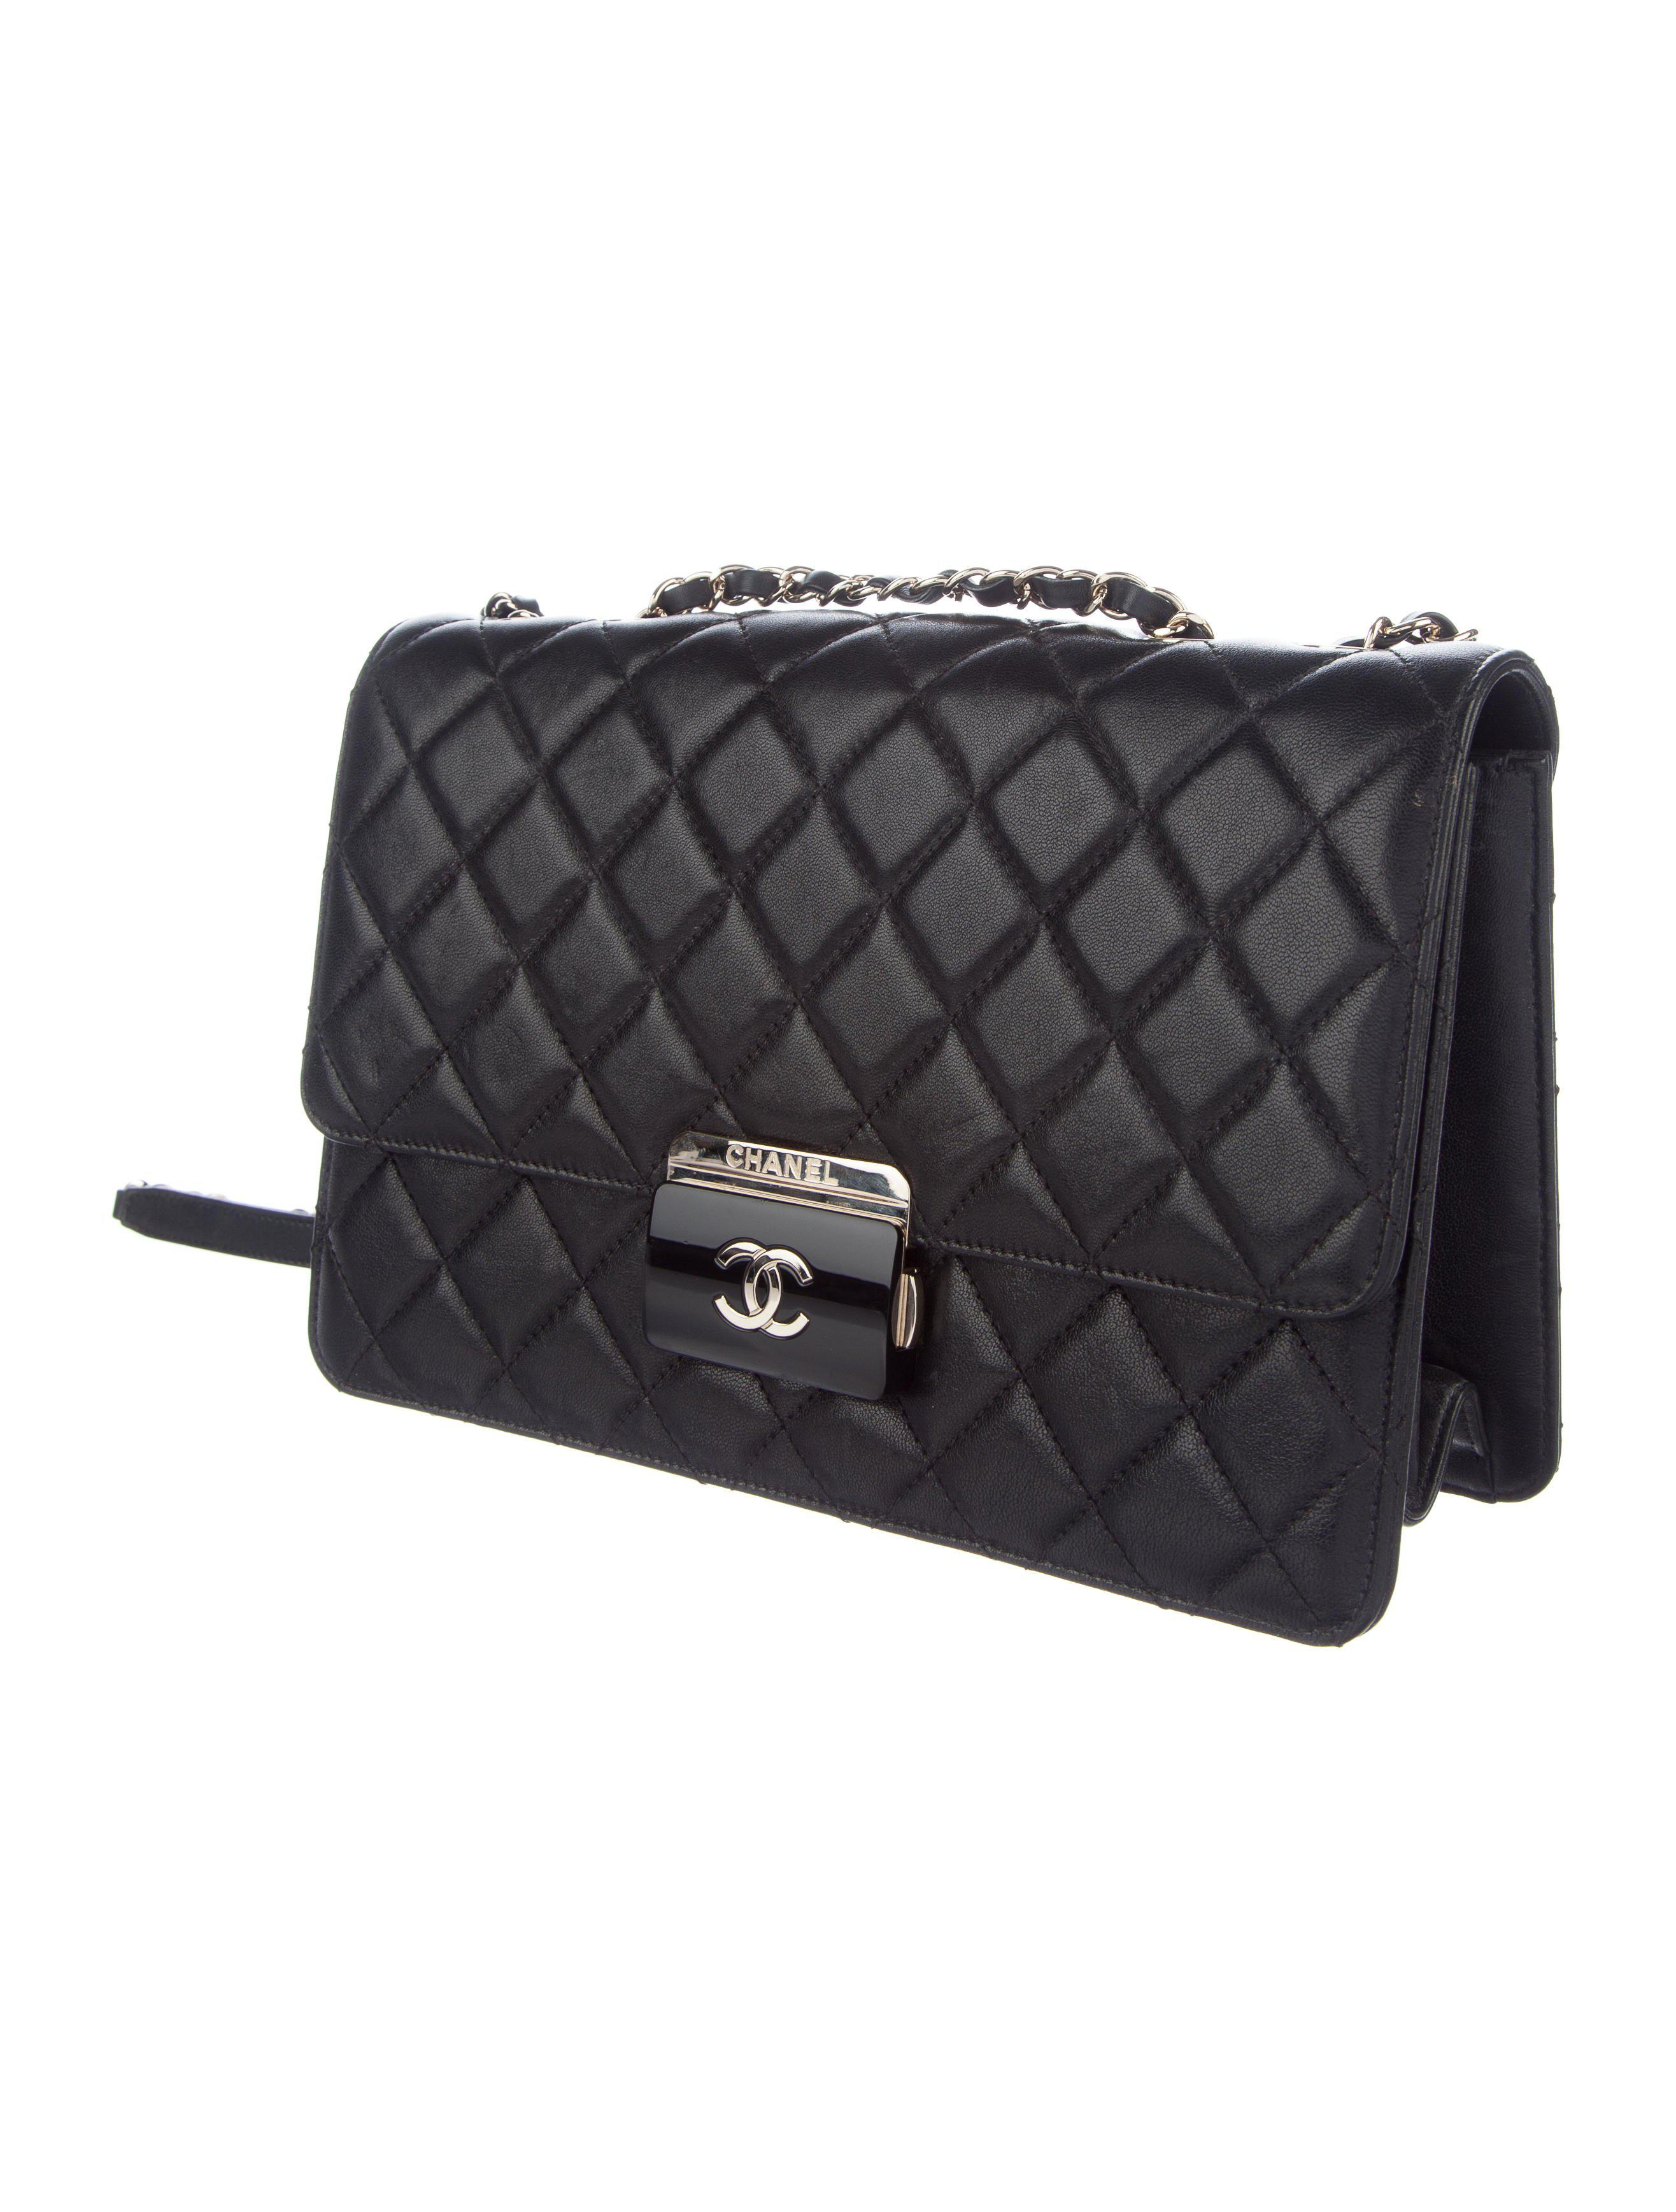 0b8950c51120 Lyst - Chanel 2017 Large Beauty Lock Flap Bag Black in Metallic